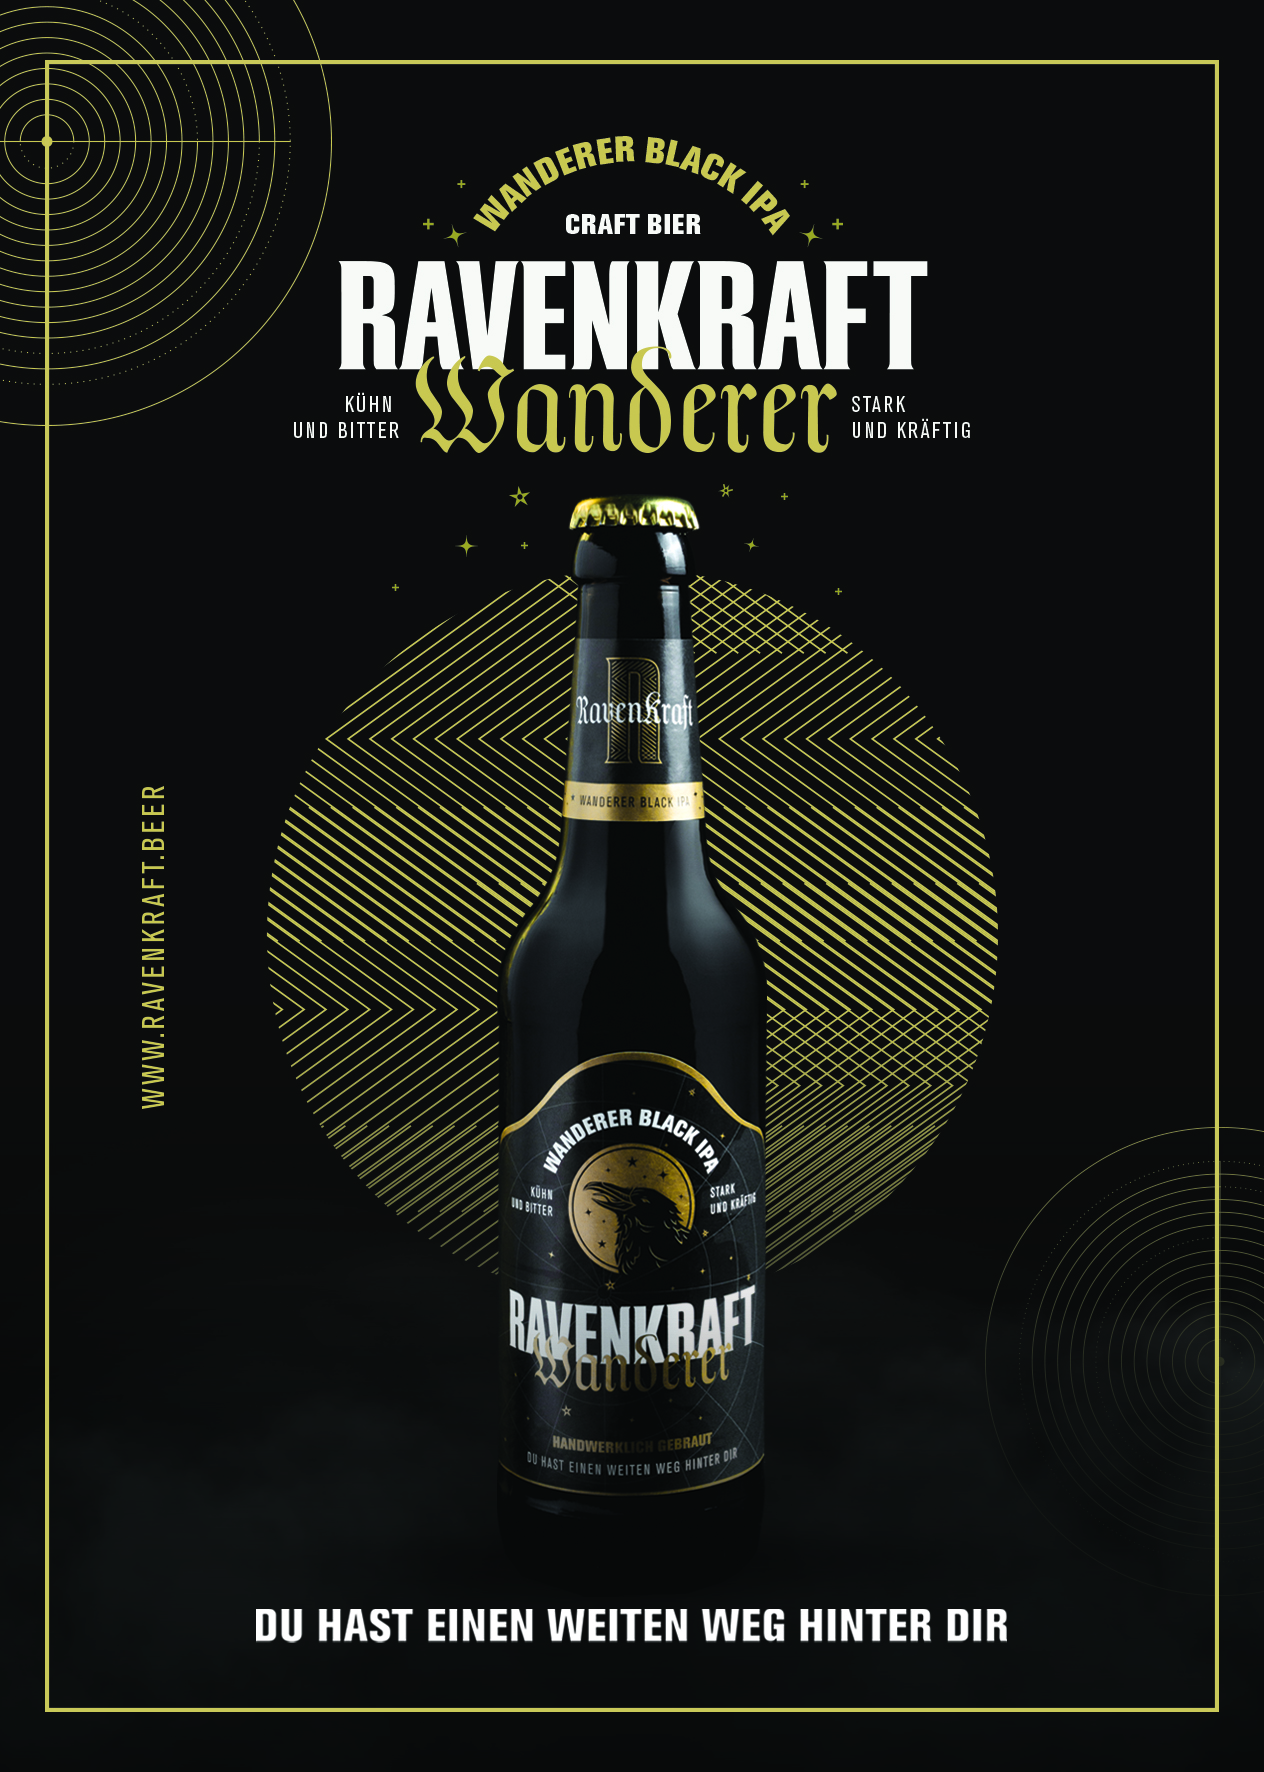 RavenKraft_flyer_2b-2.jpg